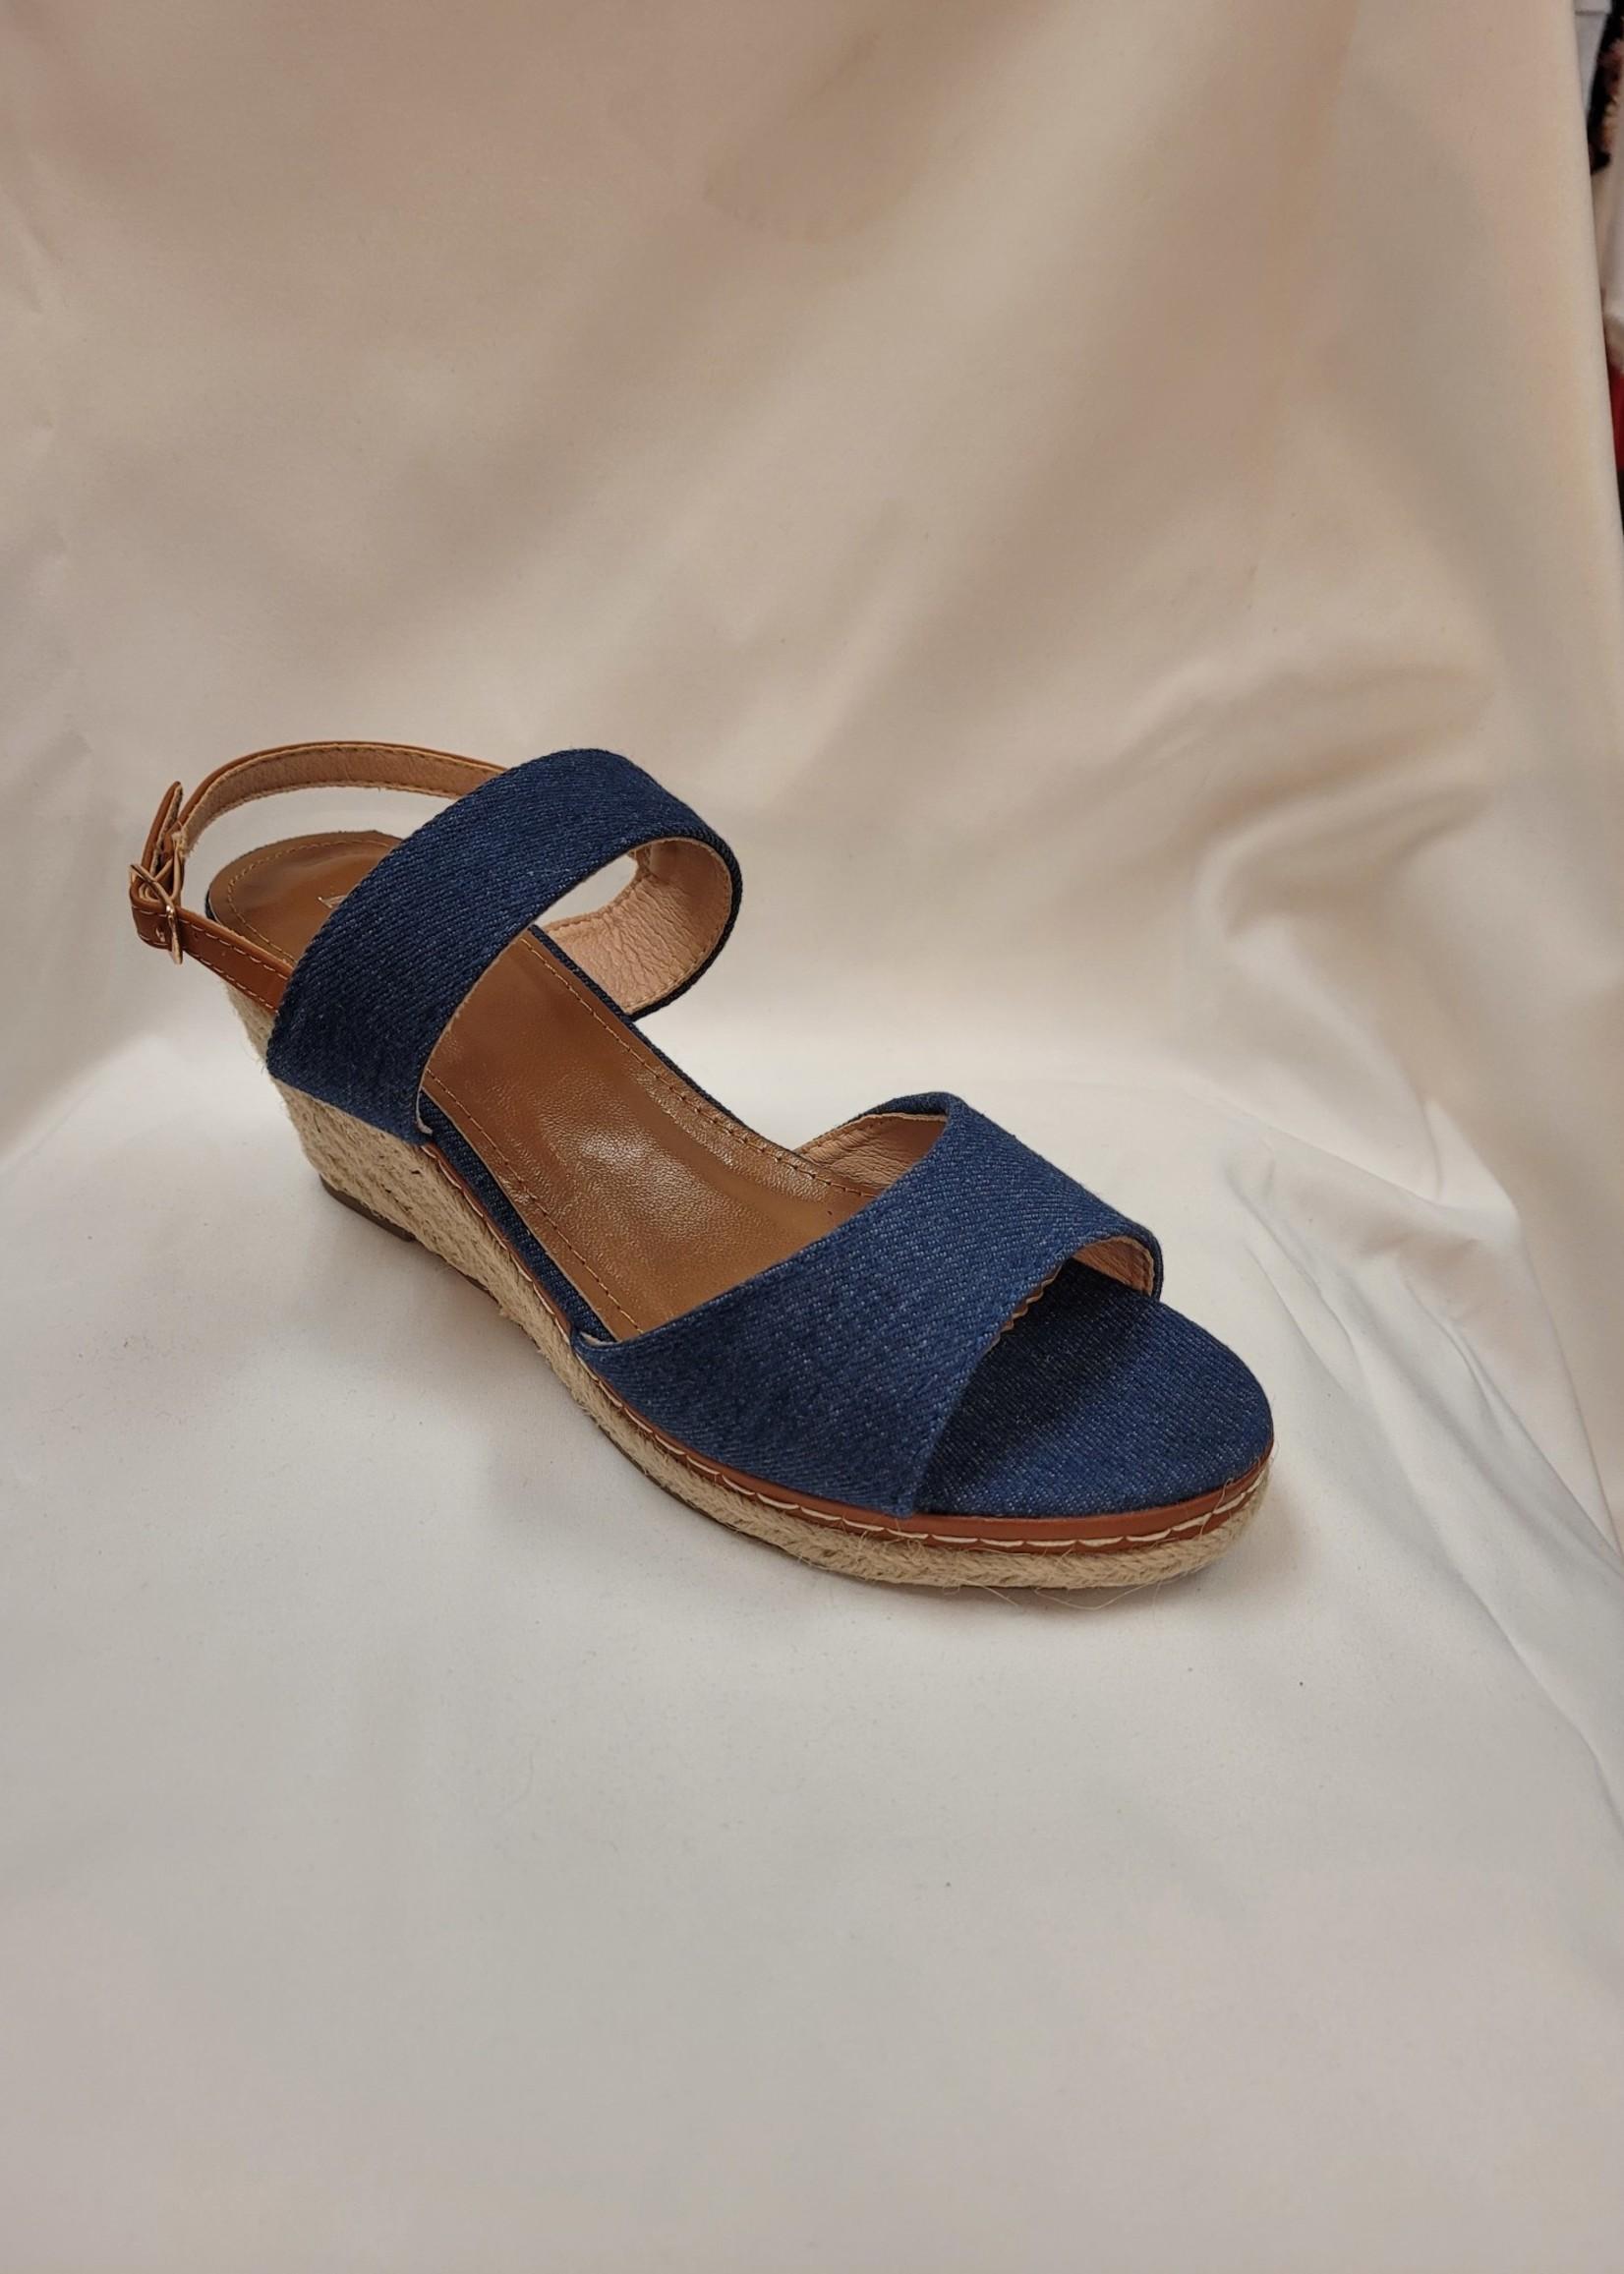 NYC wedge sandal